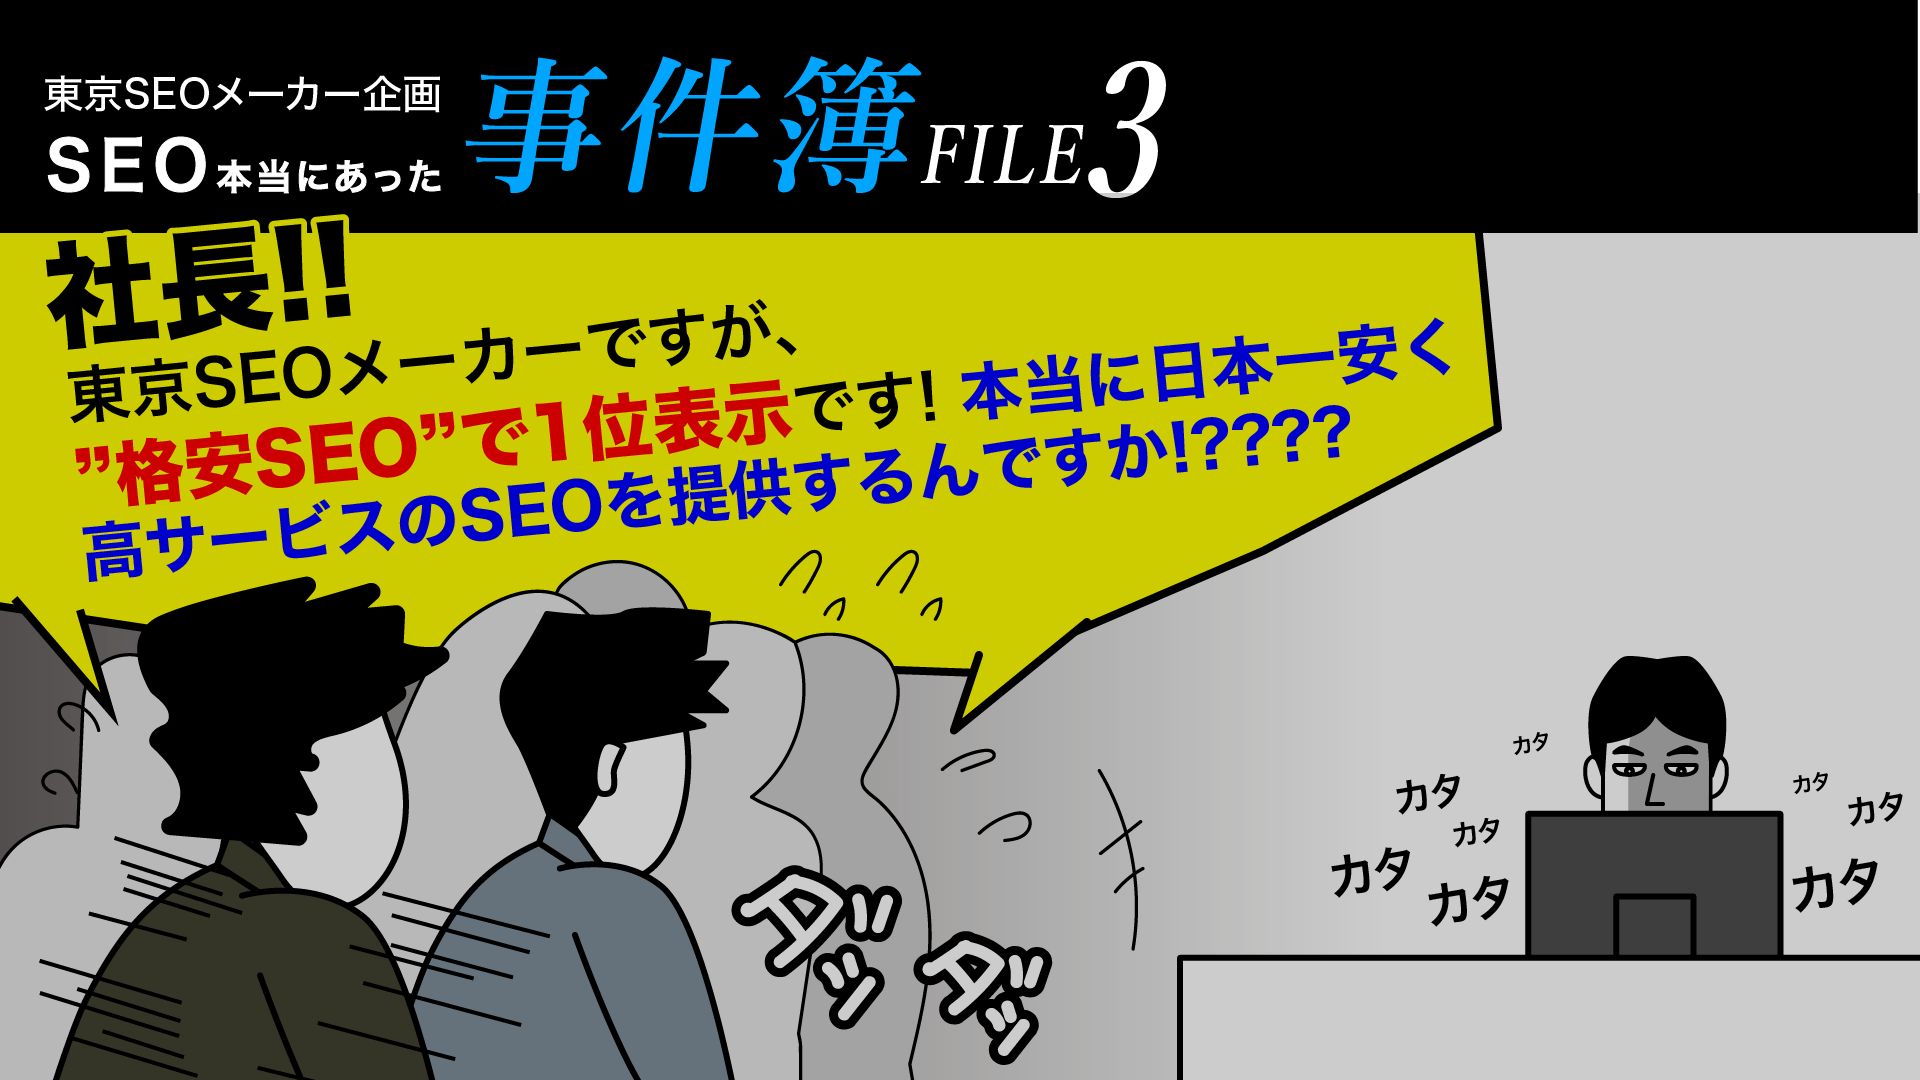 SEO本当にあった事件簿FILE3-①